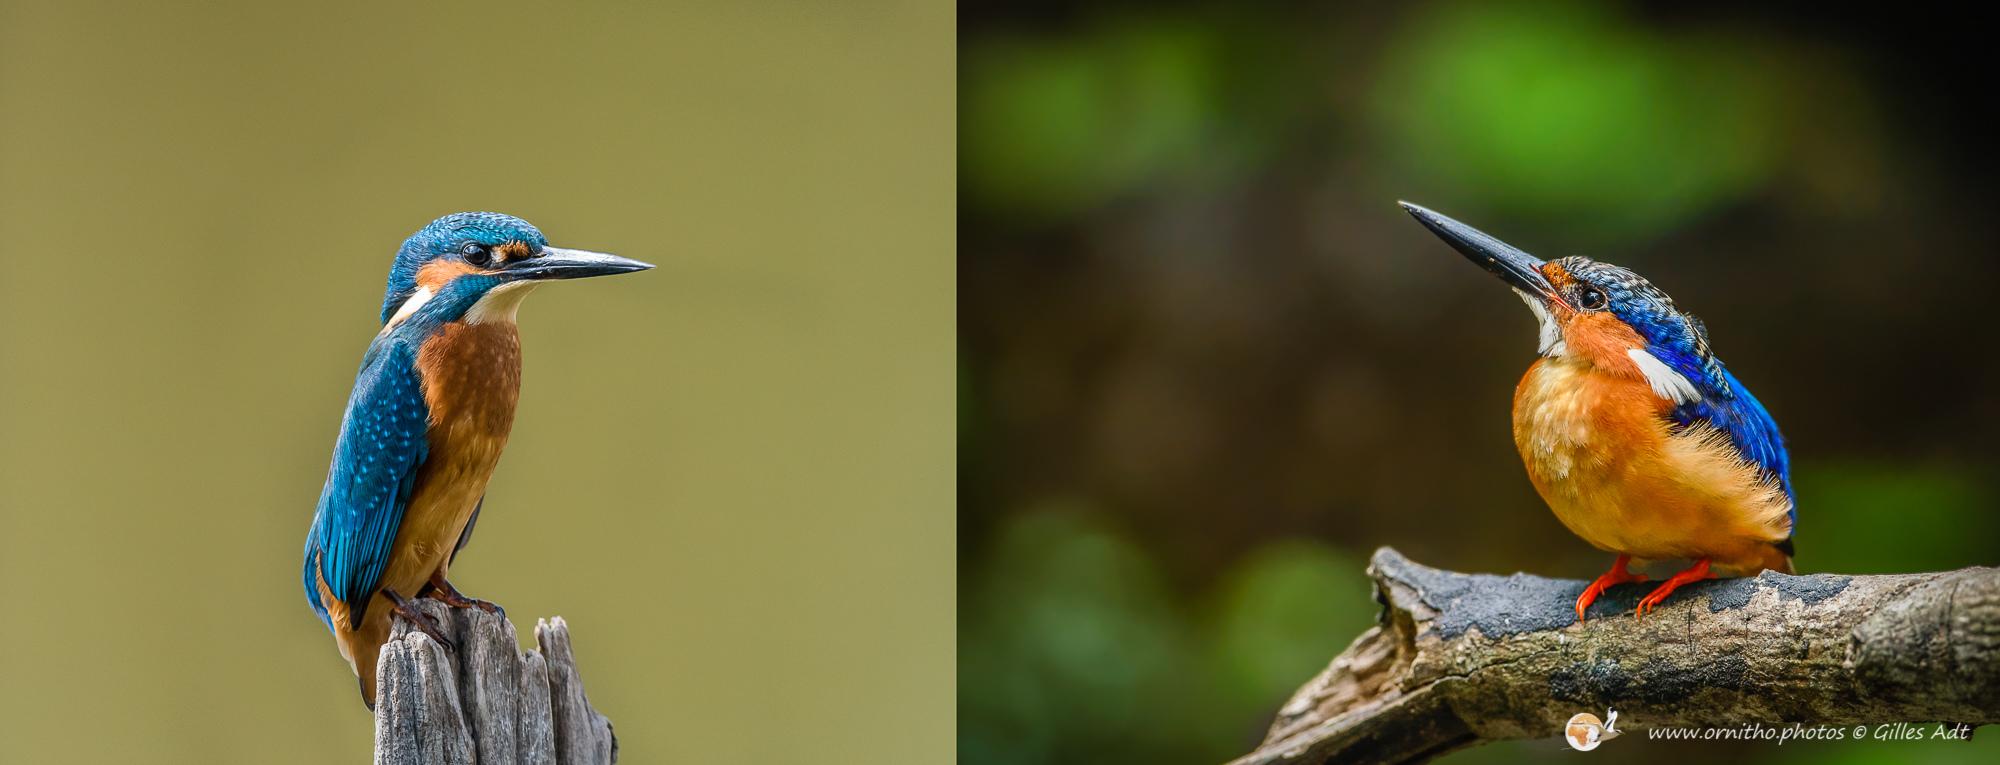 Martin-pêcheur et vintsi - © ADT Gilles